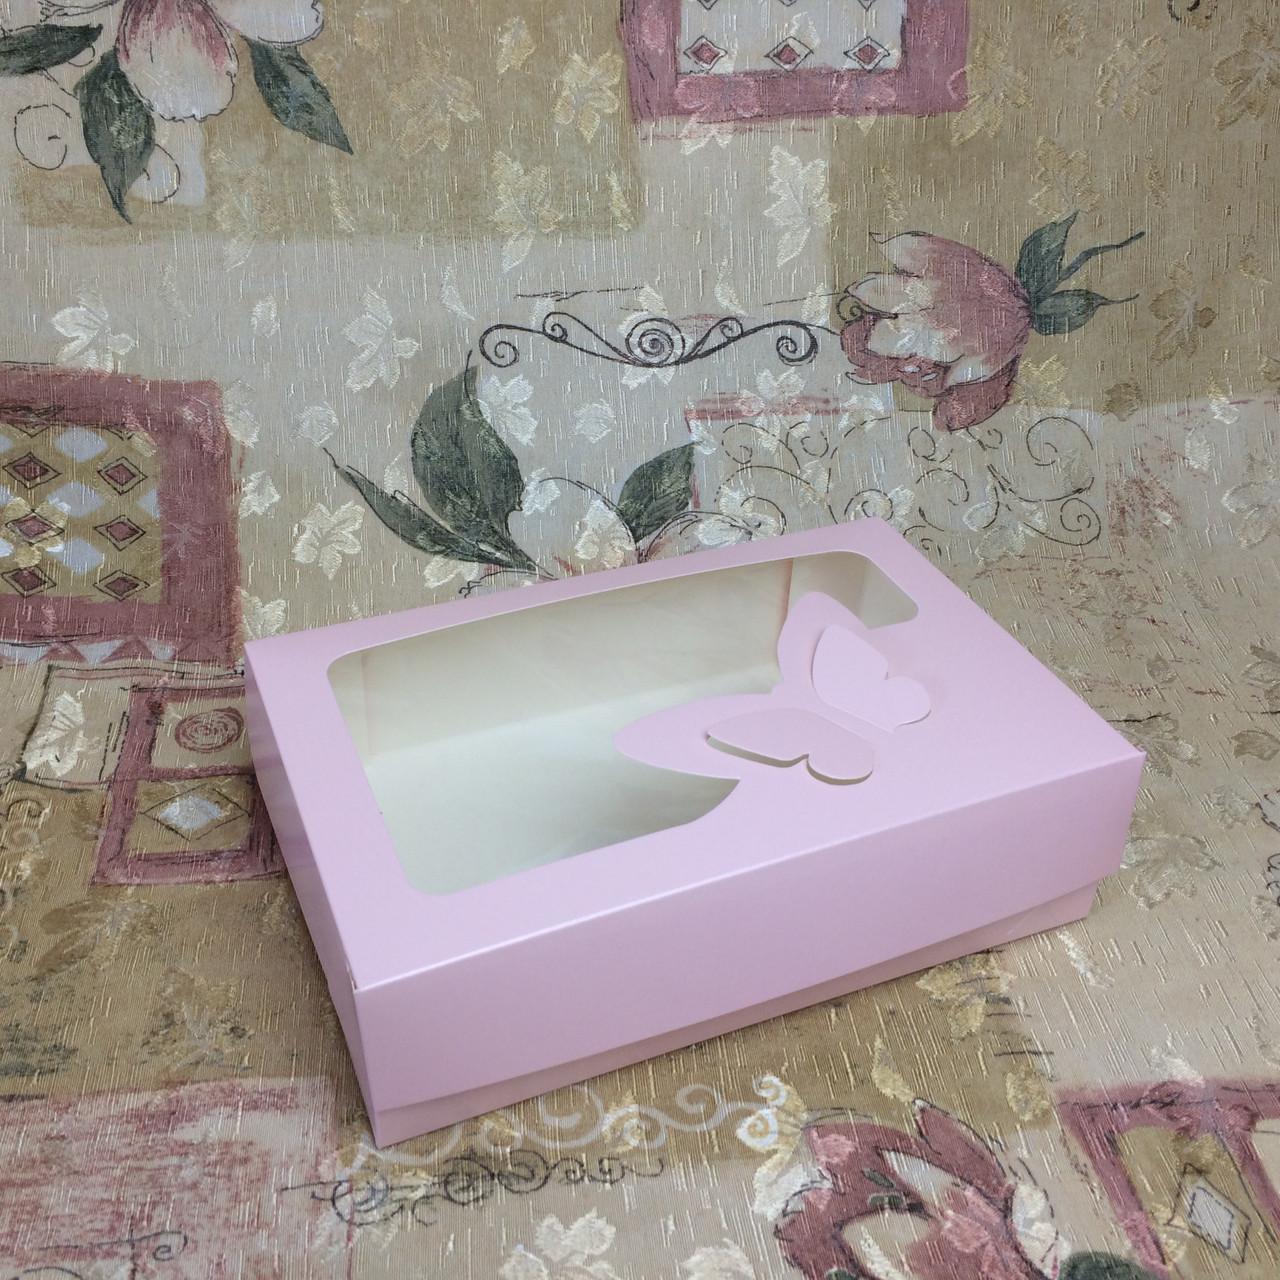 Коробка под зефир / *h=6* / 230х150х60 мм / печать-Пудр / окно-Бабочка / лк